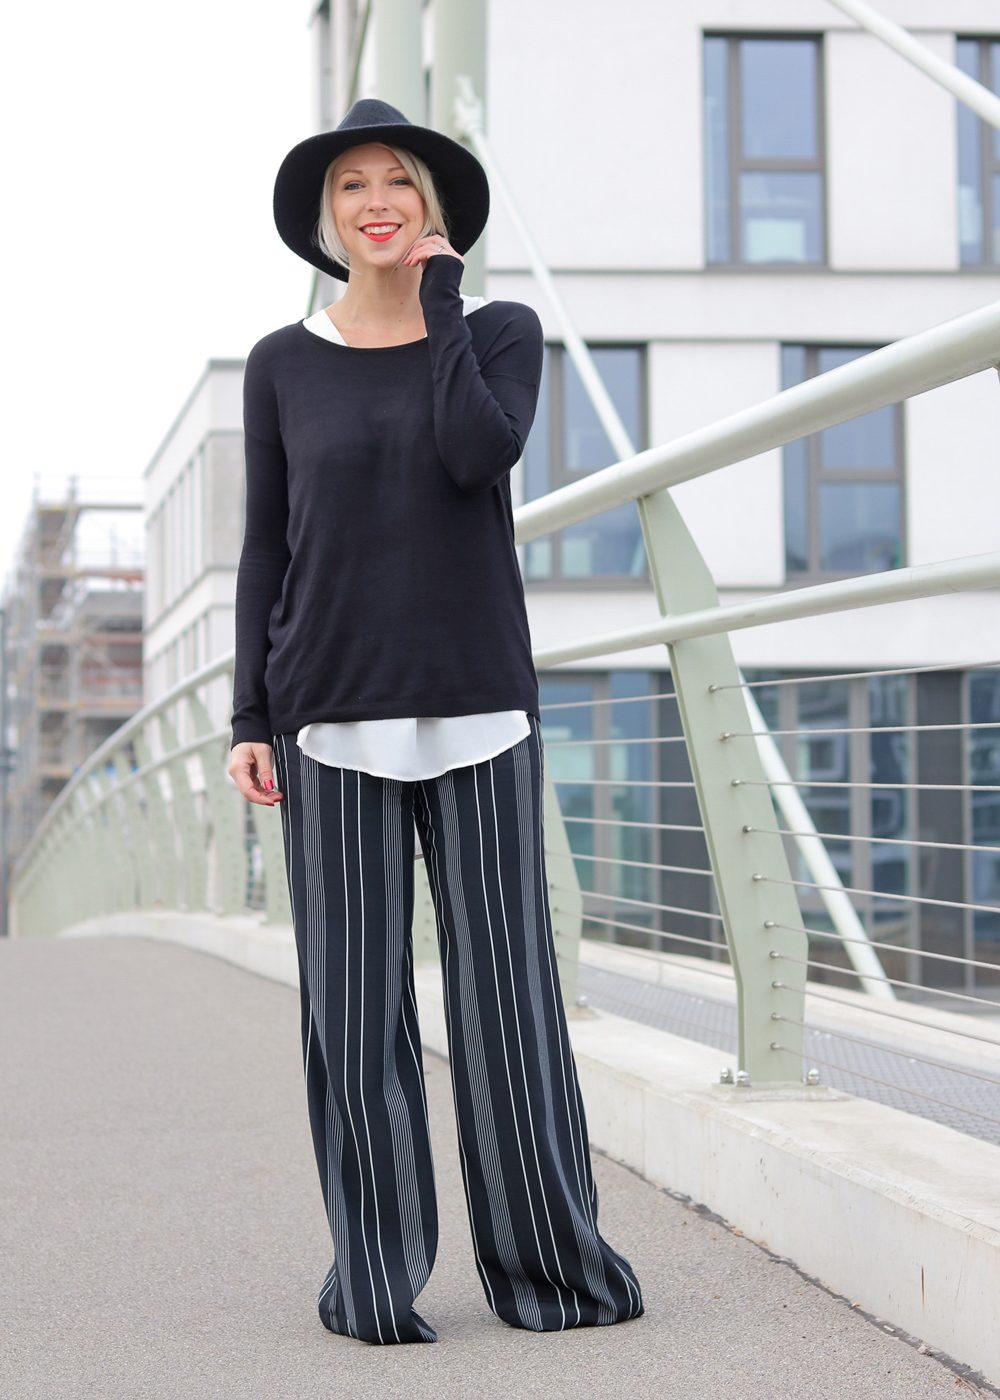 fashionblogger-outfit-palazzohose-streifen-mango-sweater-hut-1-von-17